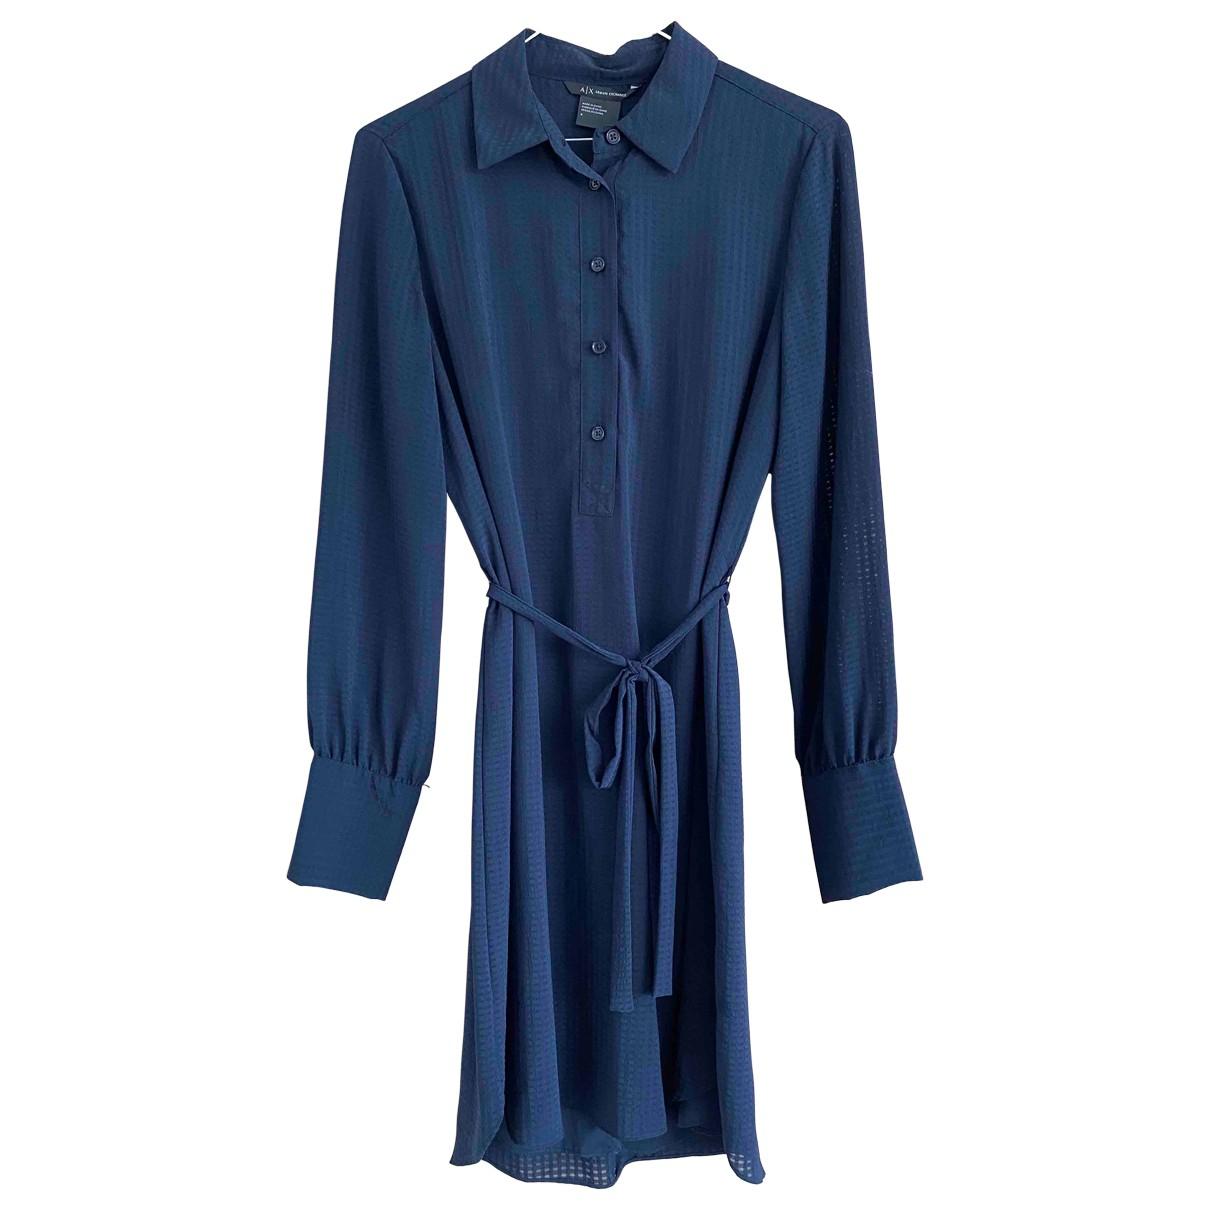 Emporio Armani \N Navy dress for Women 8 UK